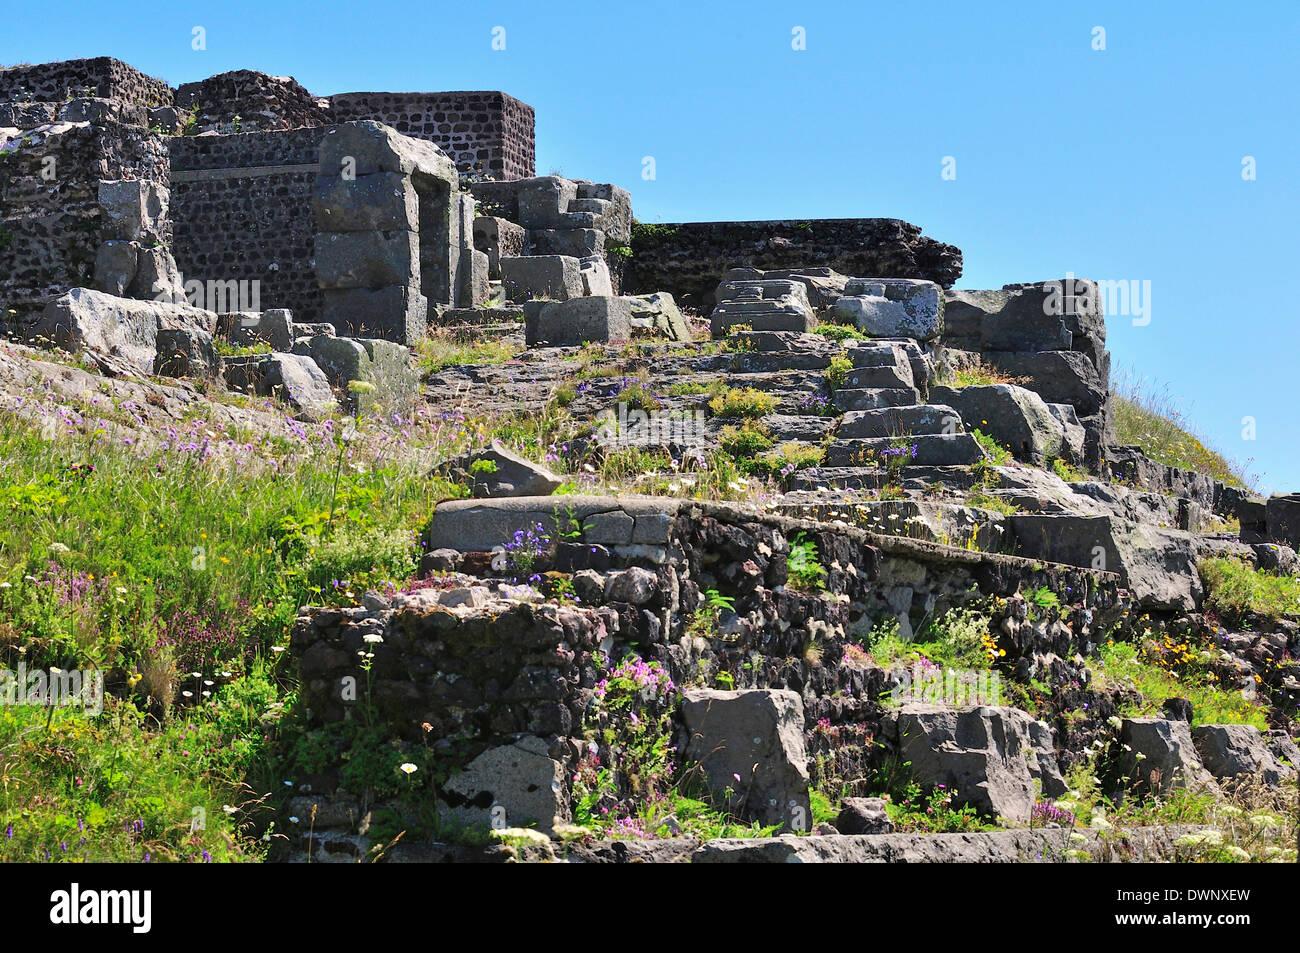 Ruins of a Roman Mercury Temple on the summit of the Puy de Dôme volcano, Puy-de-Dôme, France - Stock Image